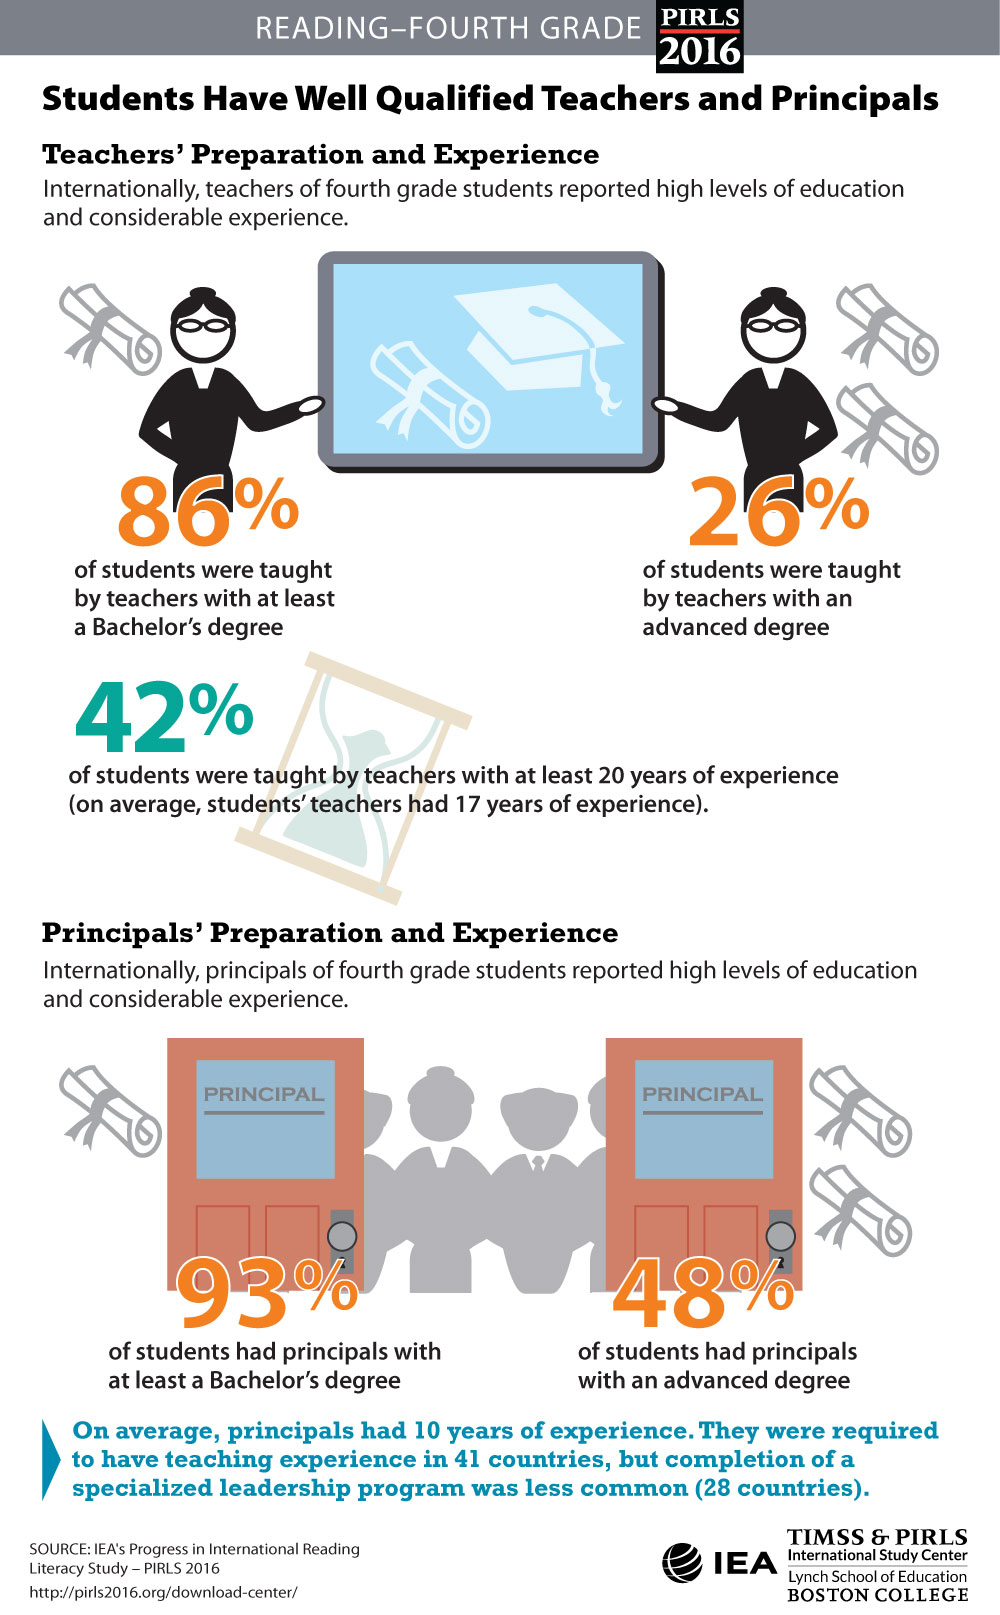 Teachers' and Principals' Preparation